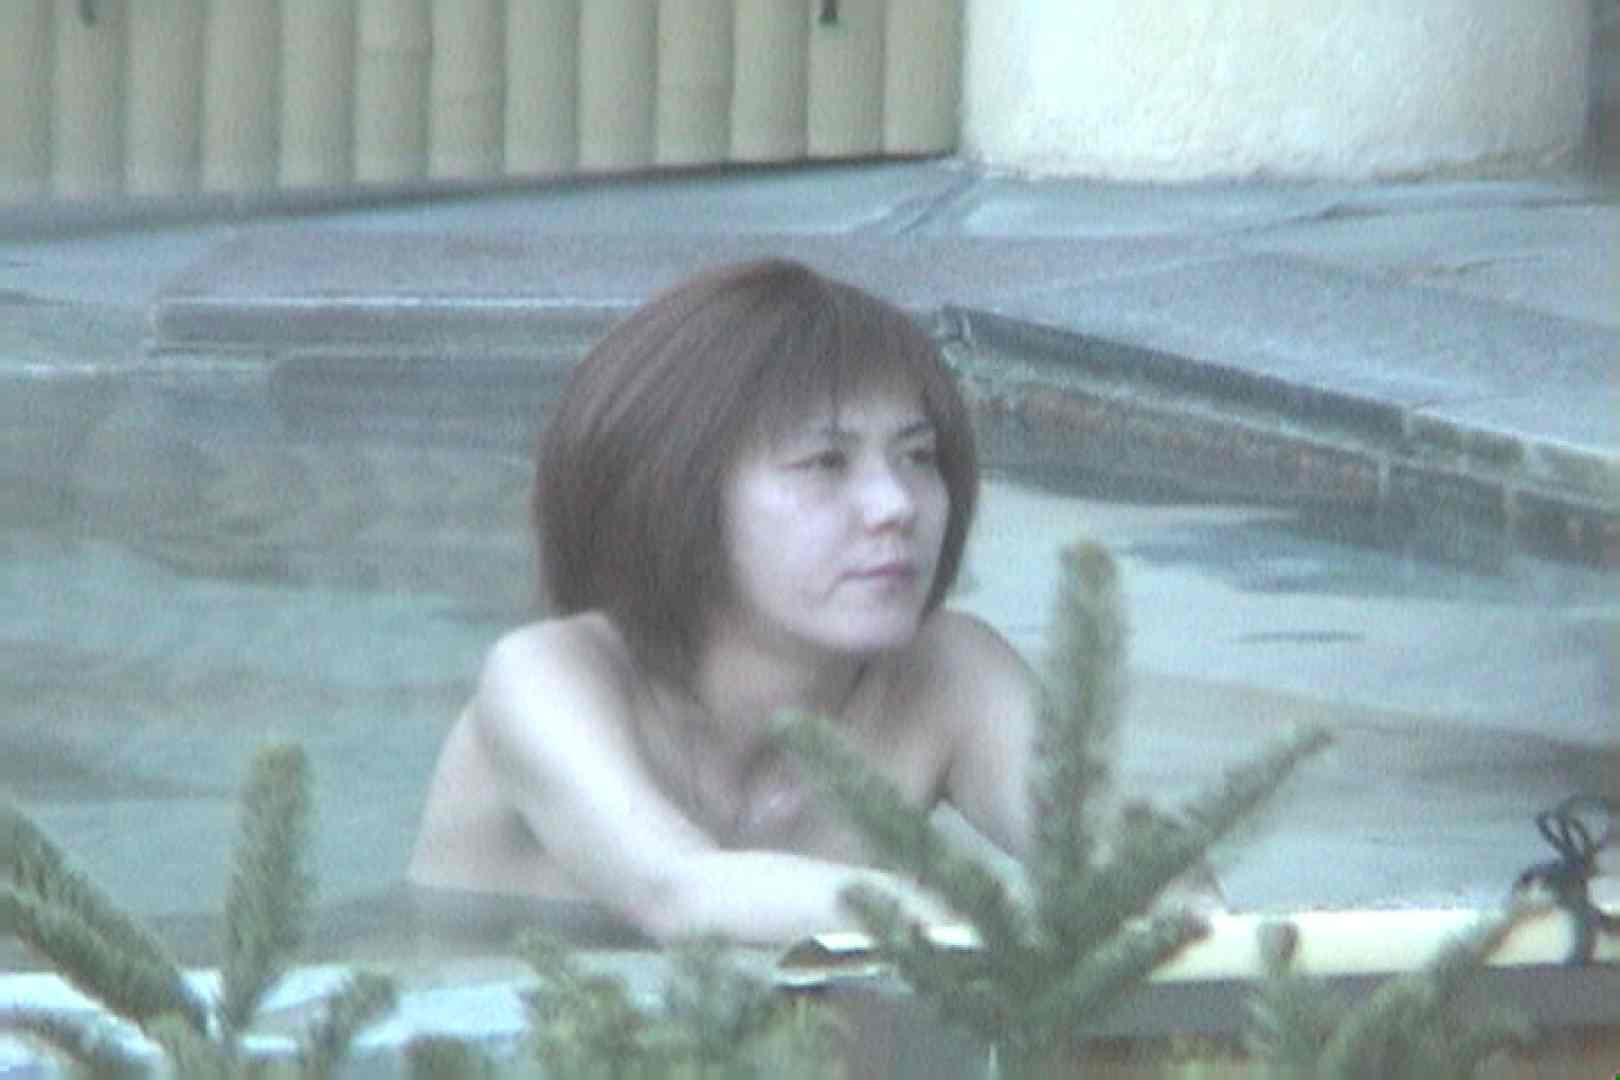 Aquaな露天風呂Vol.560 露天 | HなOL  62pic 40